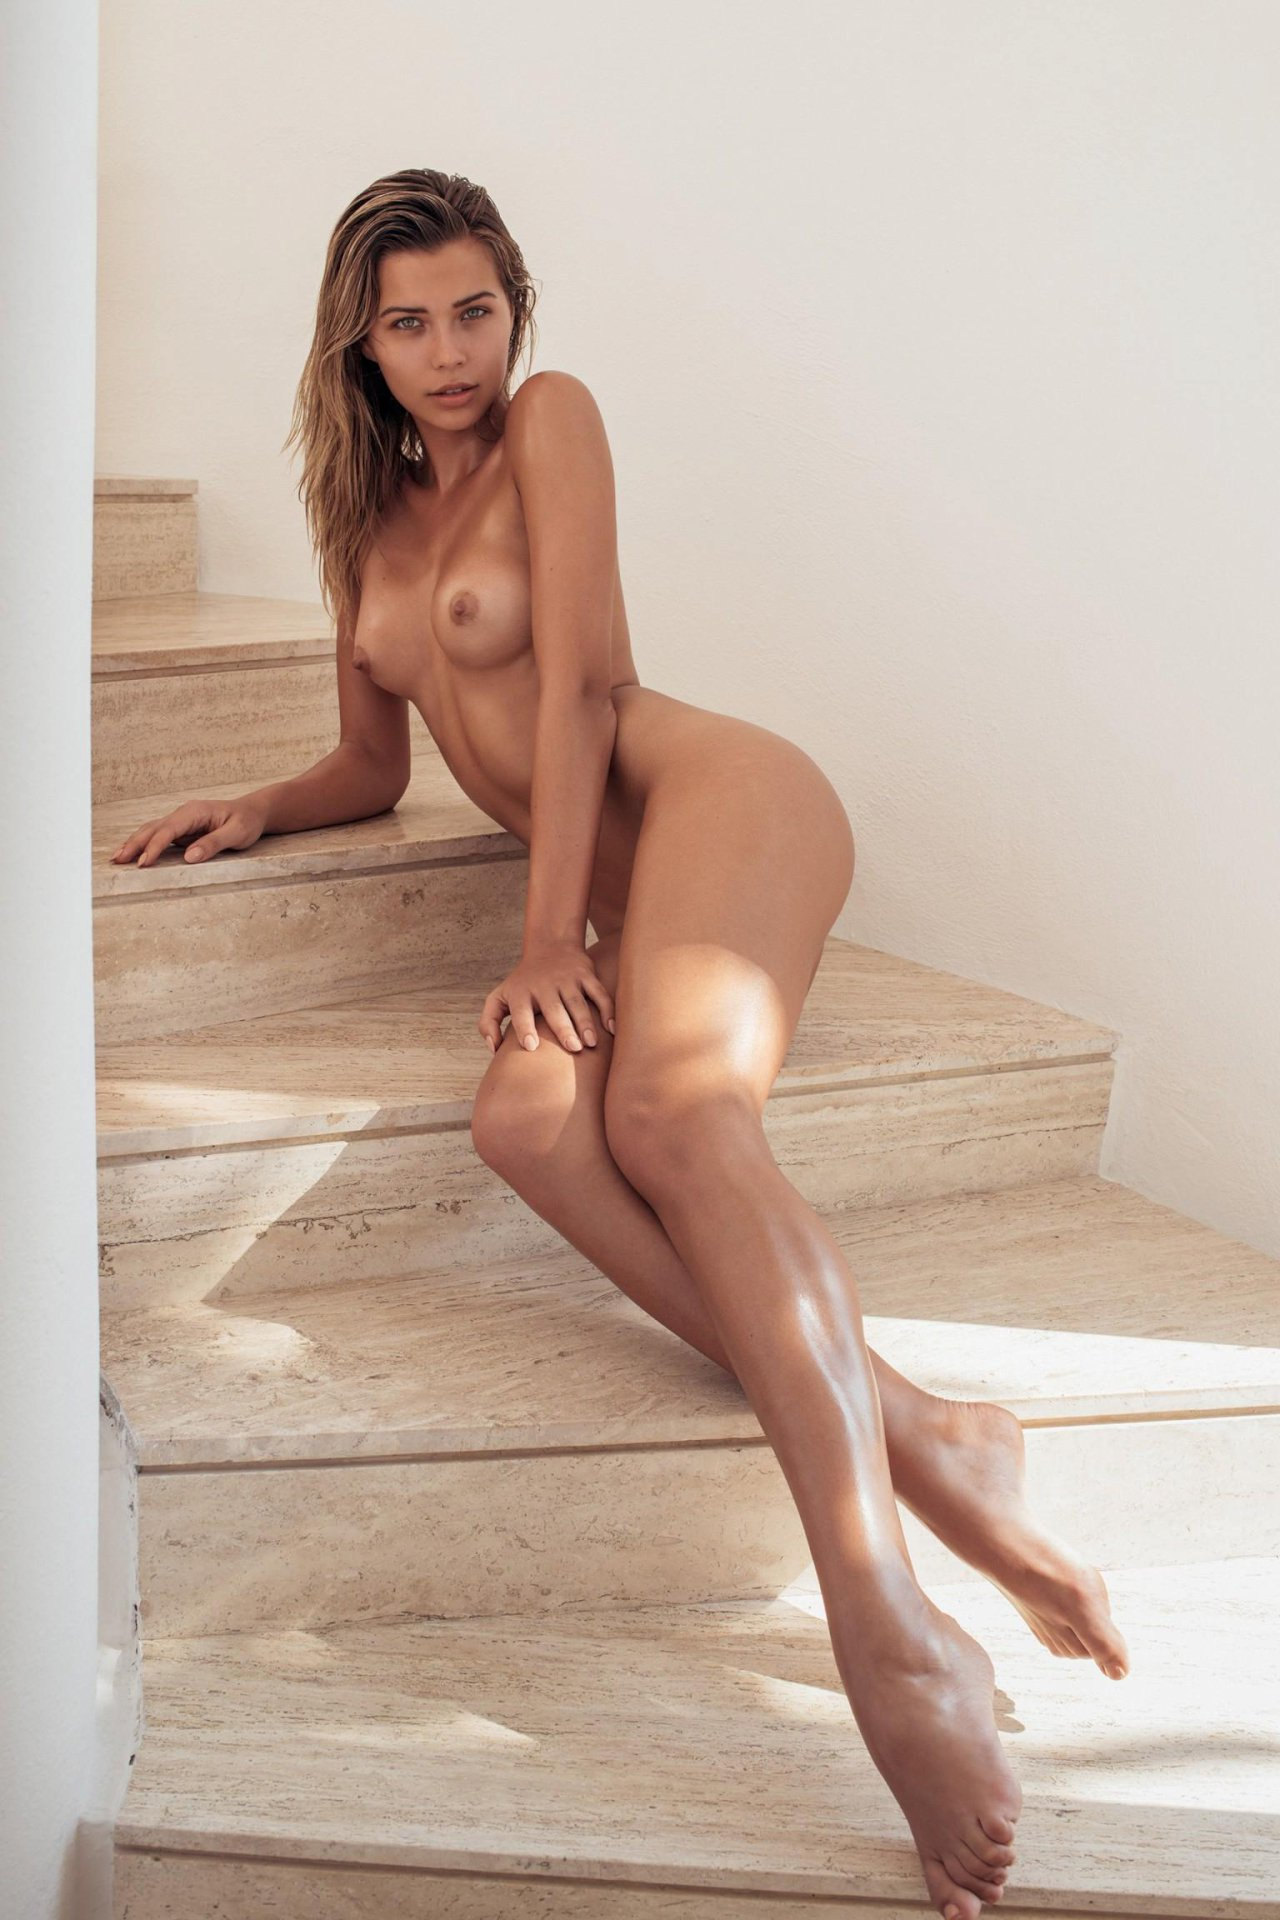 Download Sex Pics Sandra Kubicka Naked Photoshoot Hot Celebs Home